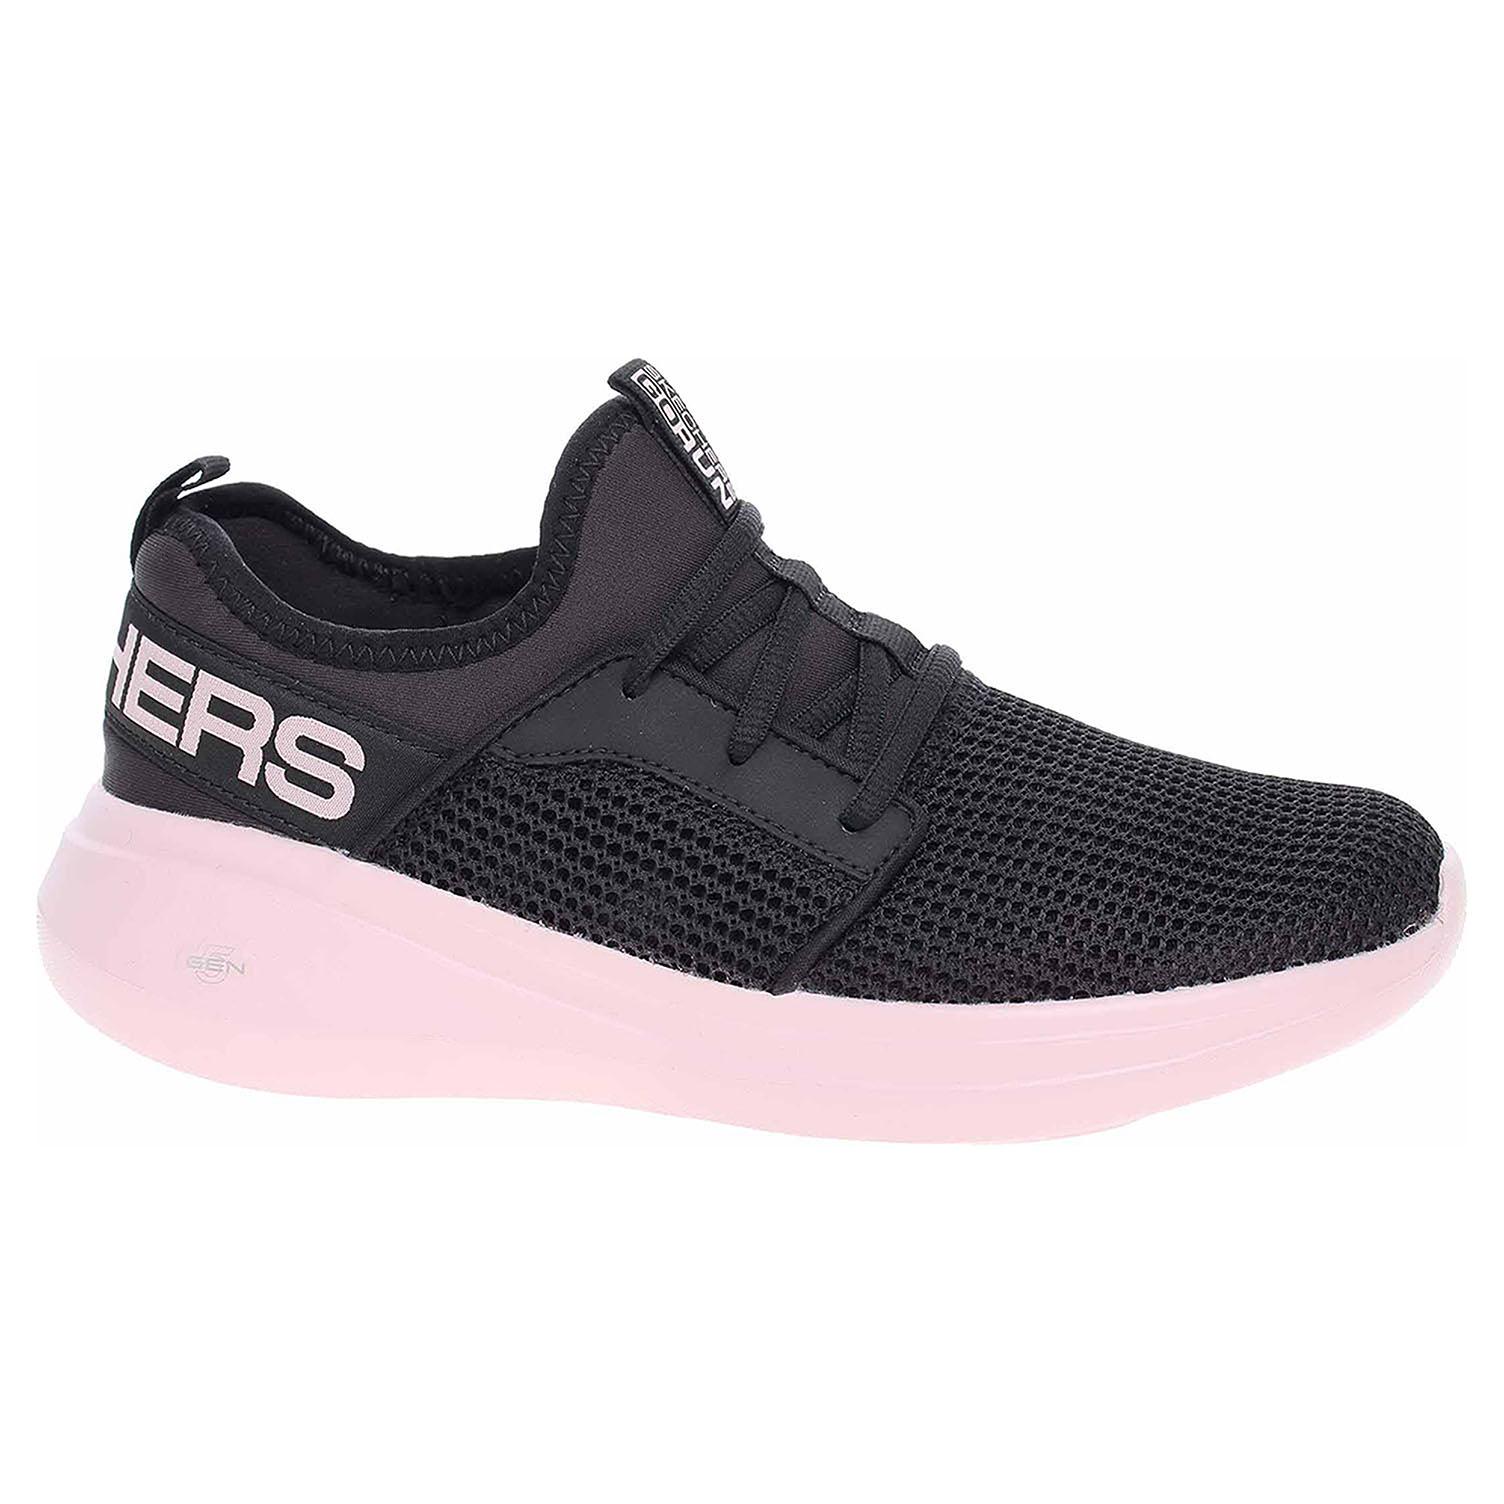 Skechers Go Run Fast - Quick Step black-pink 128010 BKPK 38,5